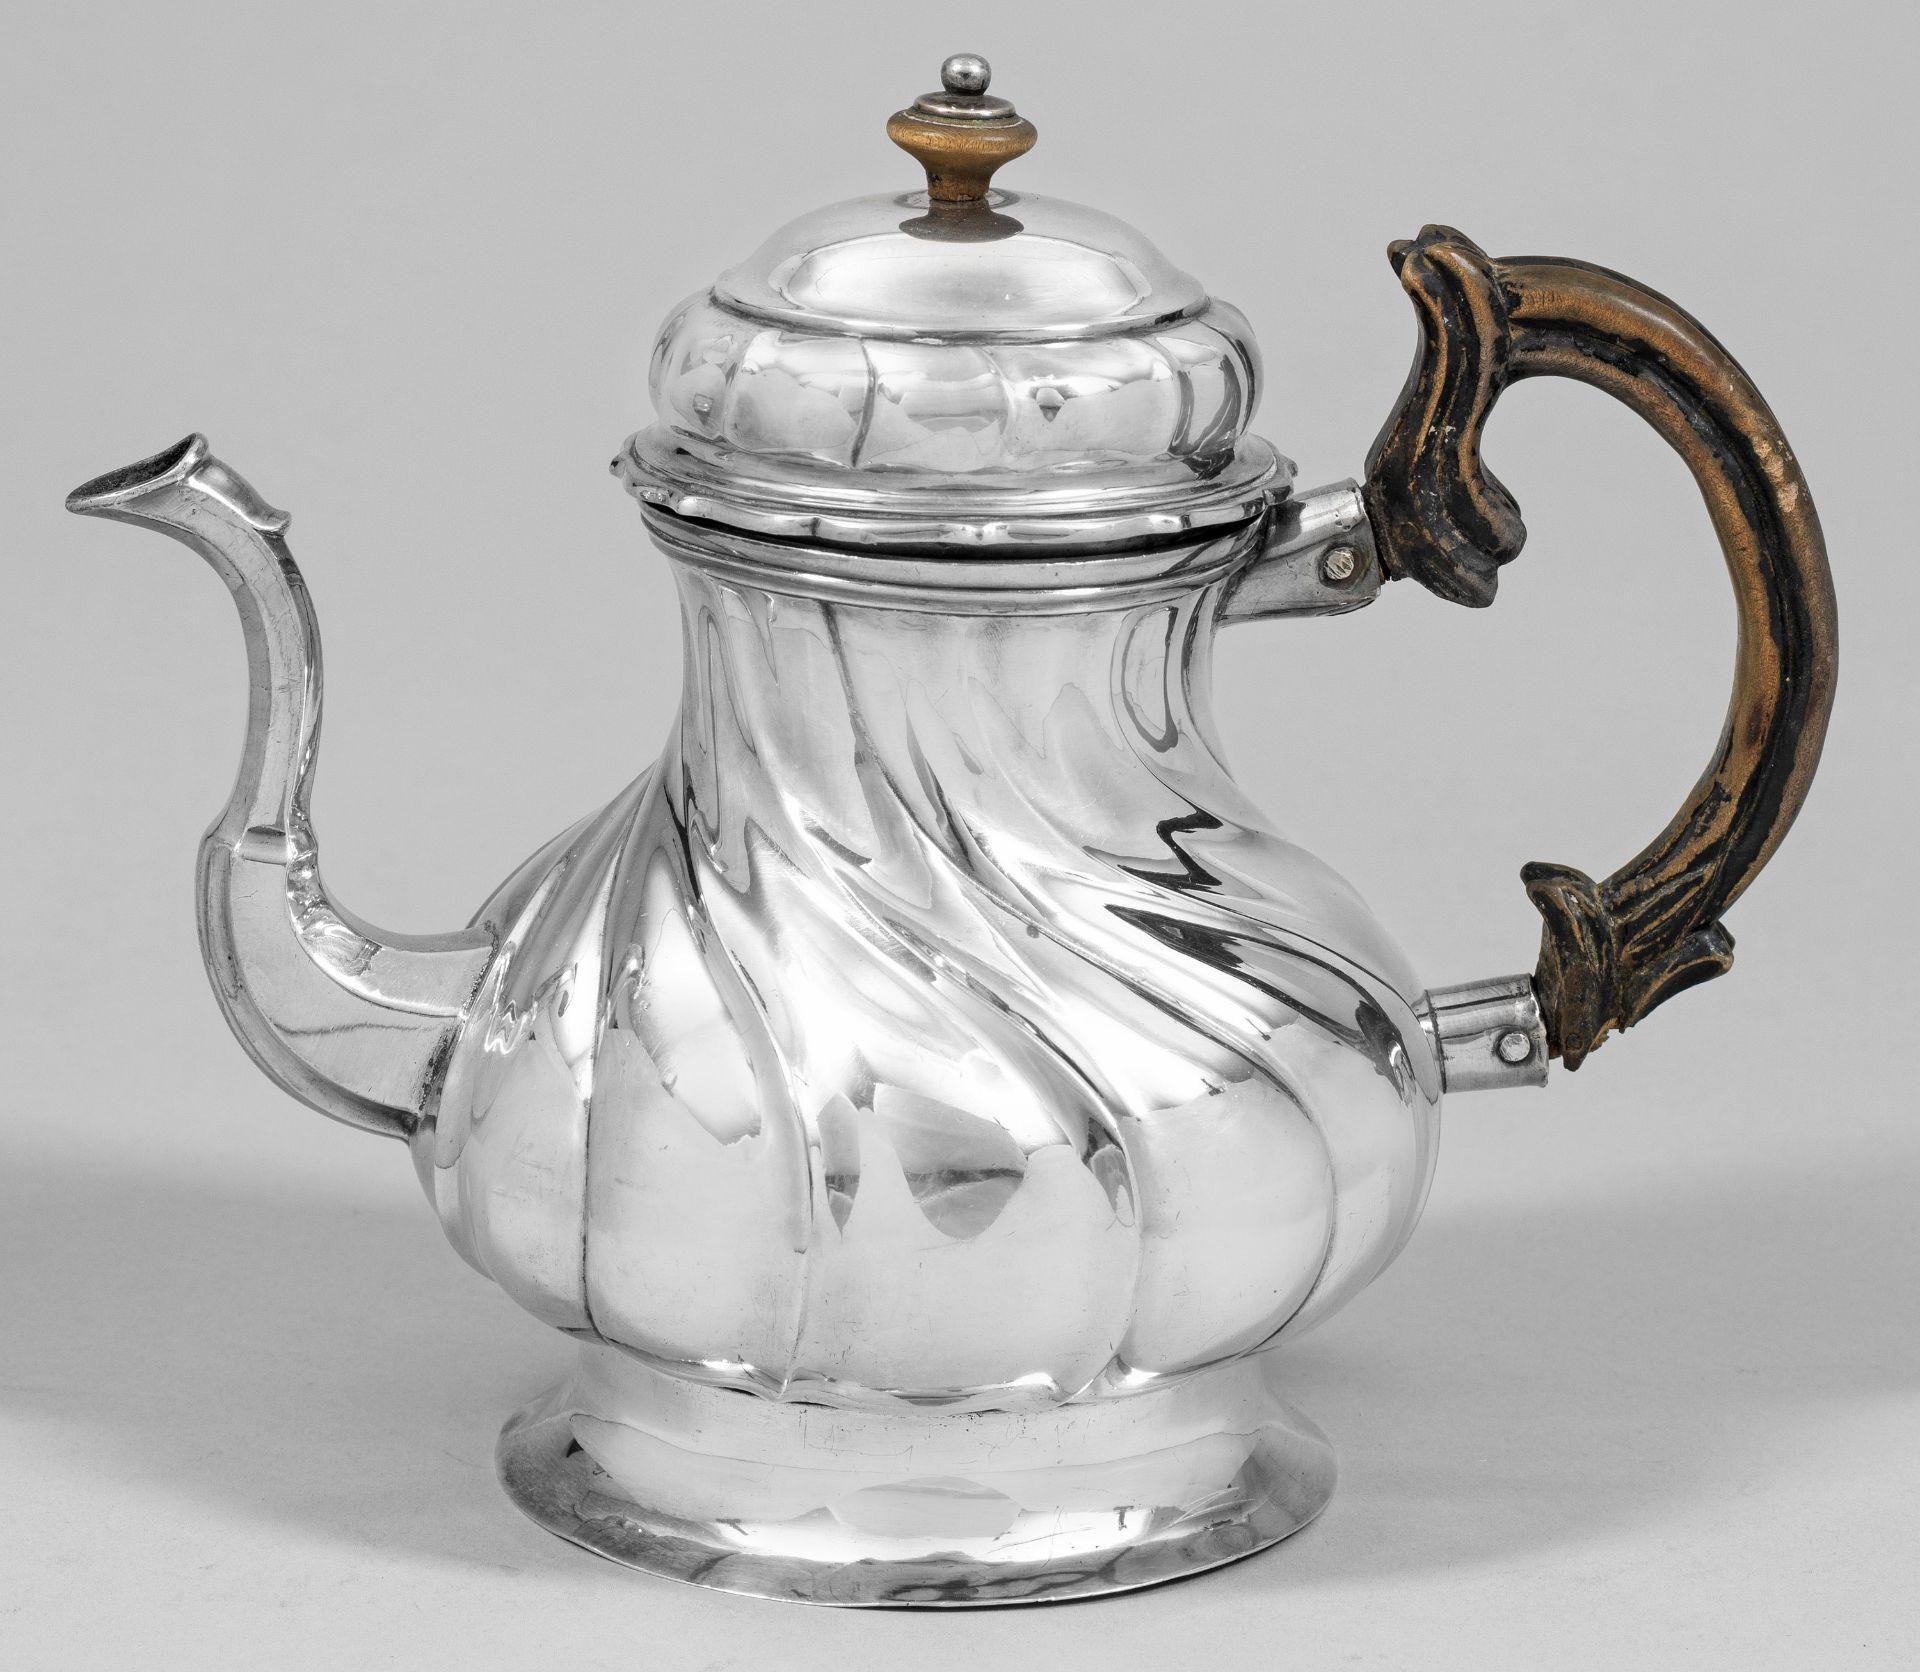 Sehr seltene Rokoko-Teekanne